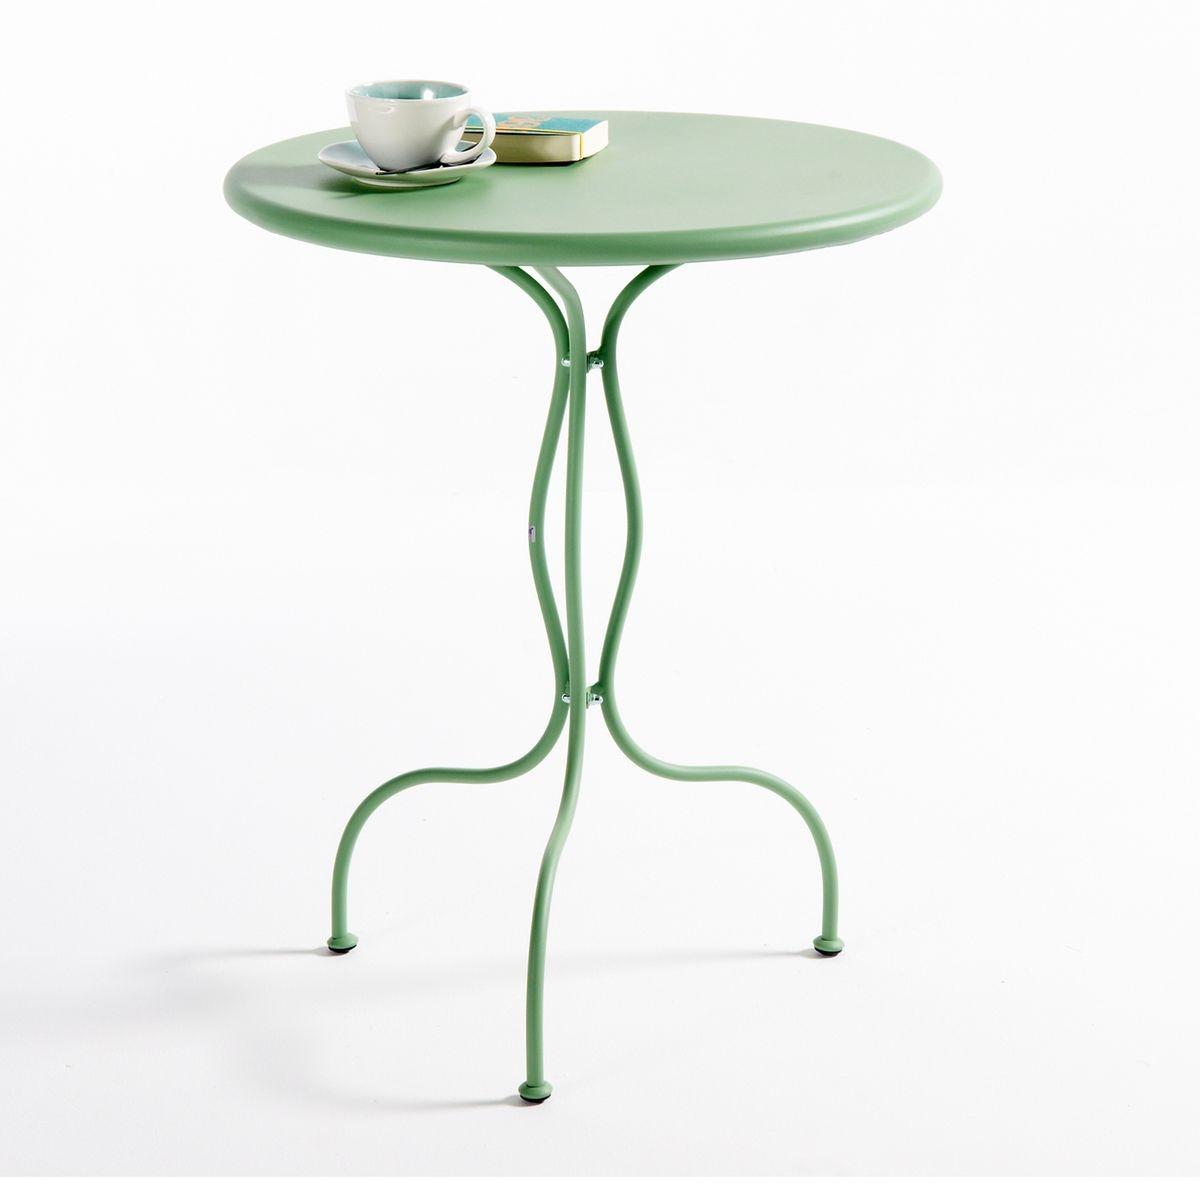 bien choisir une table de jardin en fer forg pas ch re. Black Bedroom Furniture Sets. Home Design Ideas